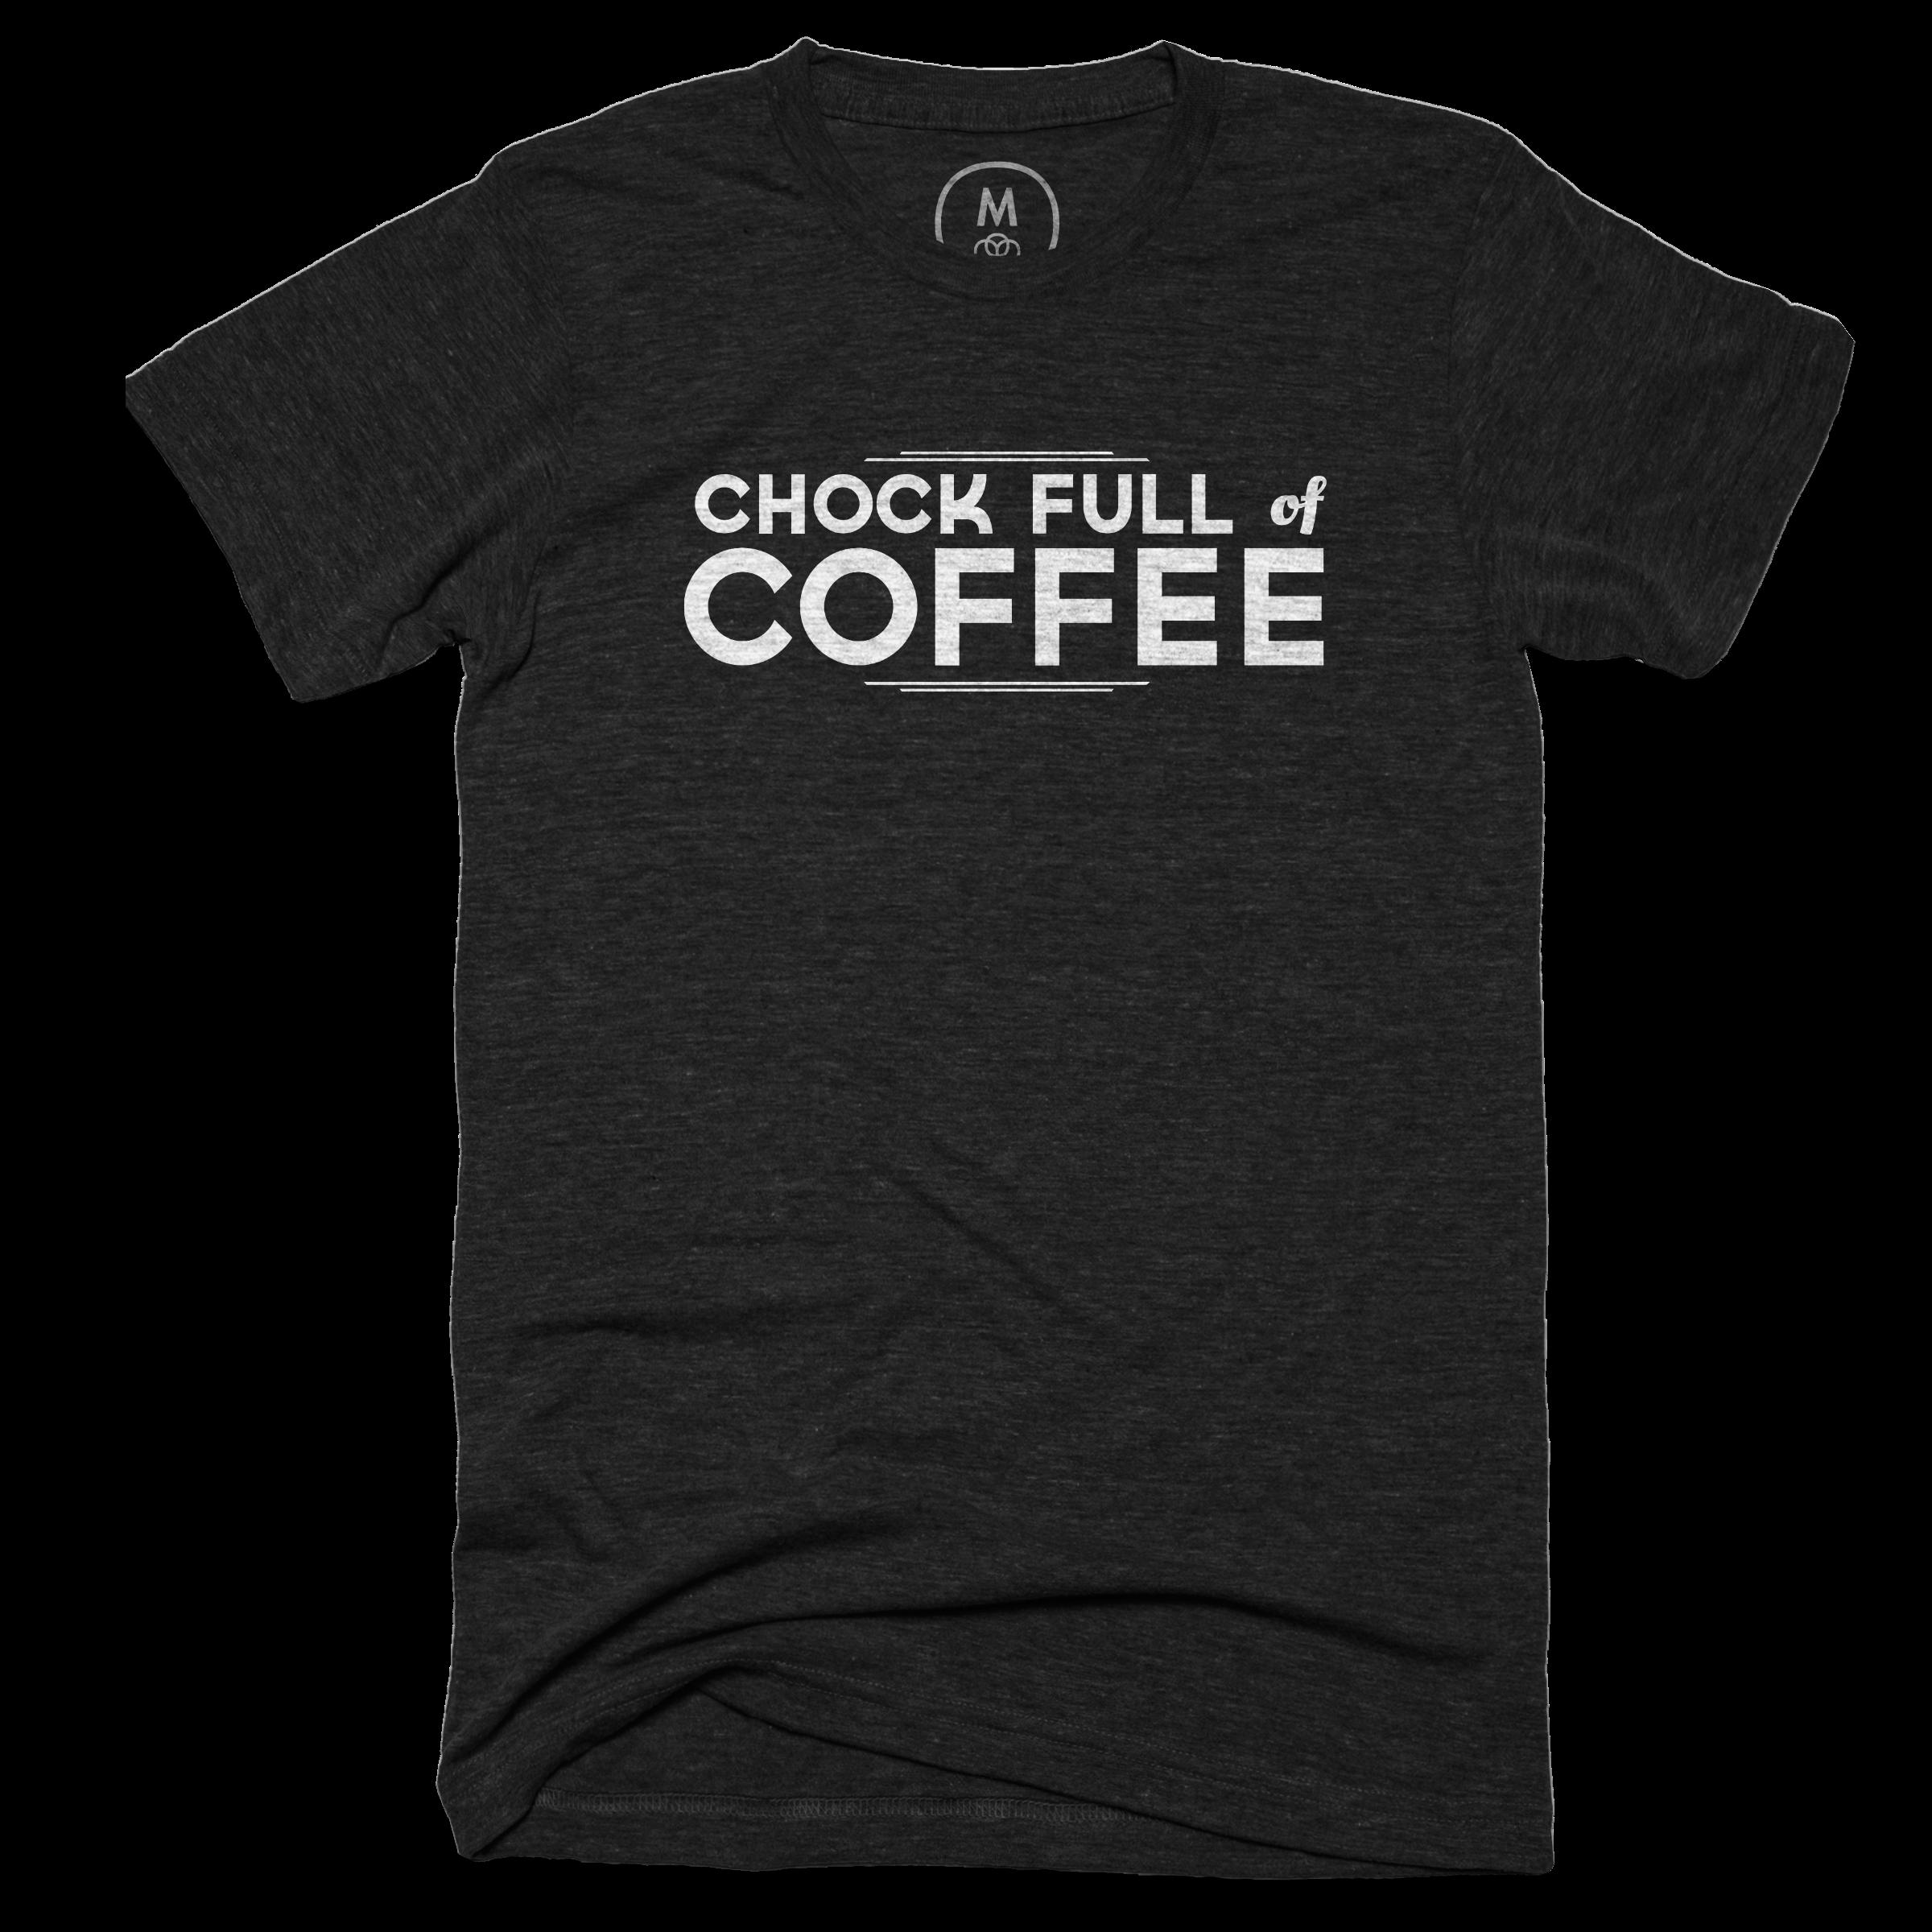 Chock Full of Coffee